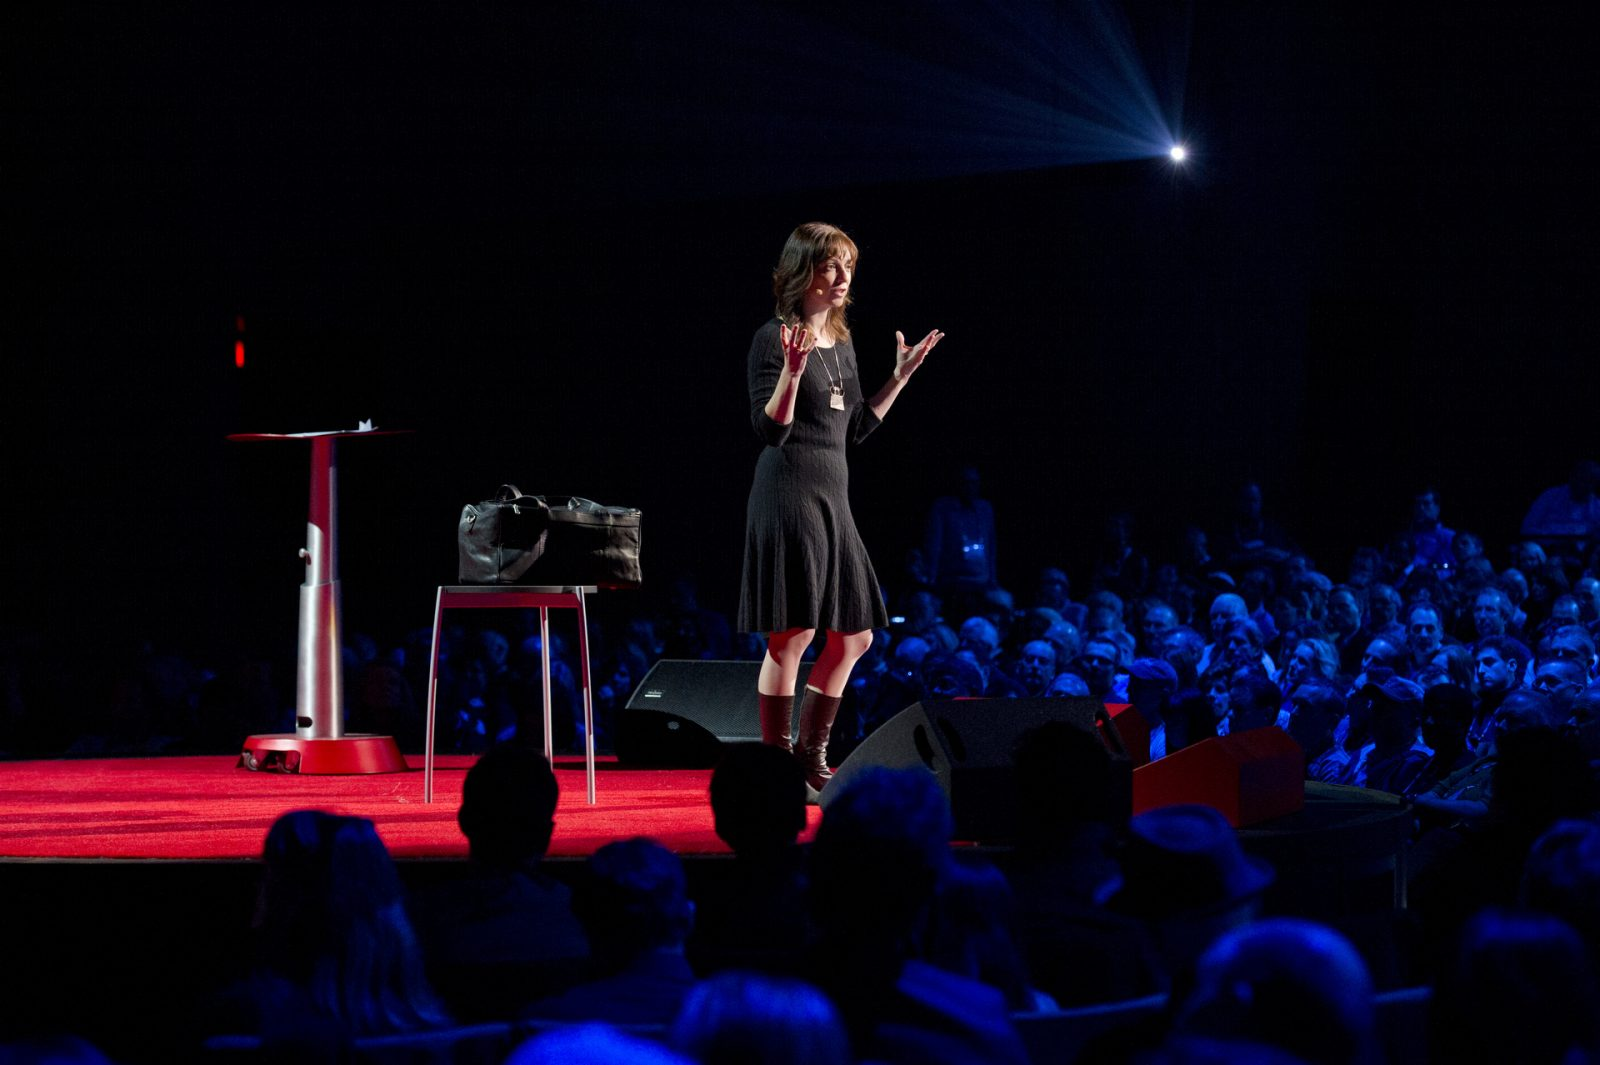 TEDTalksqueirãomudarasuavida